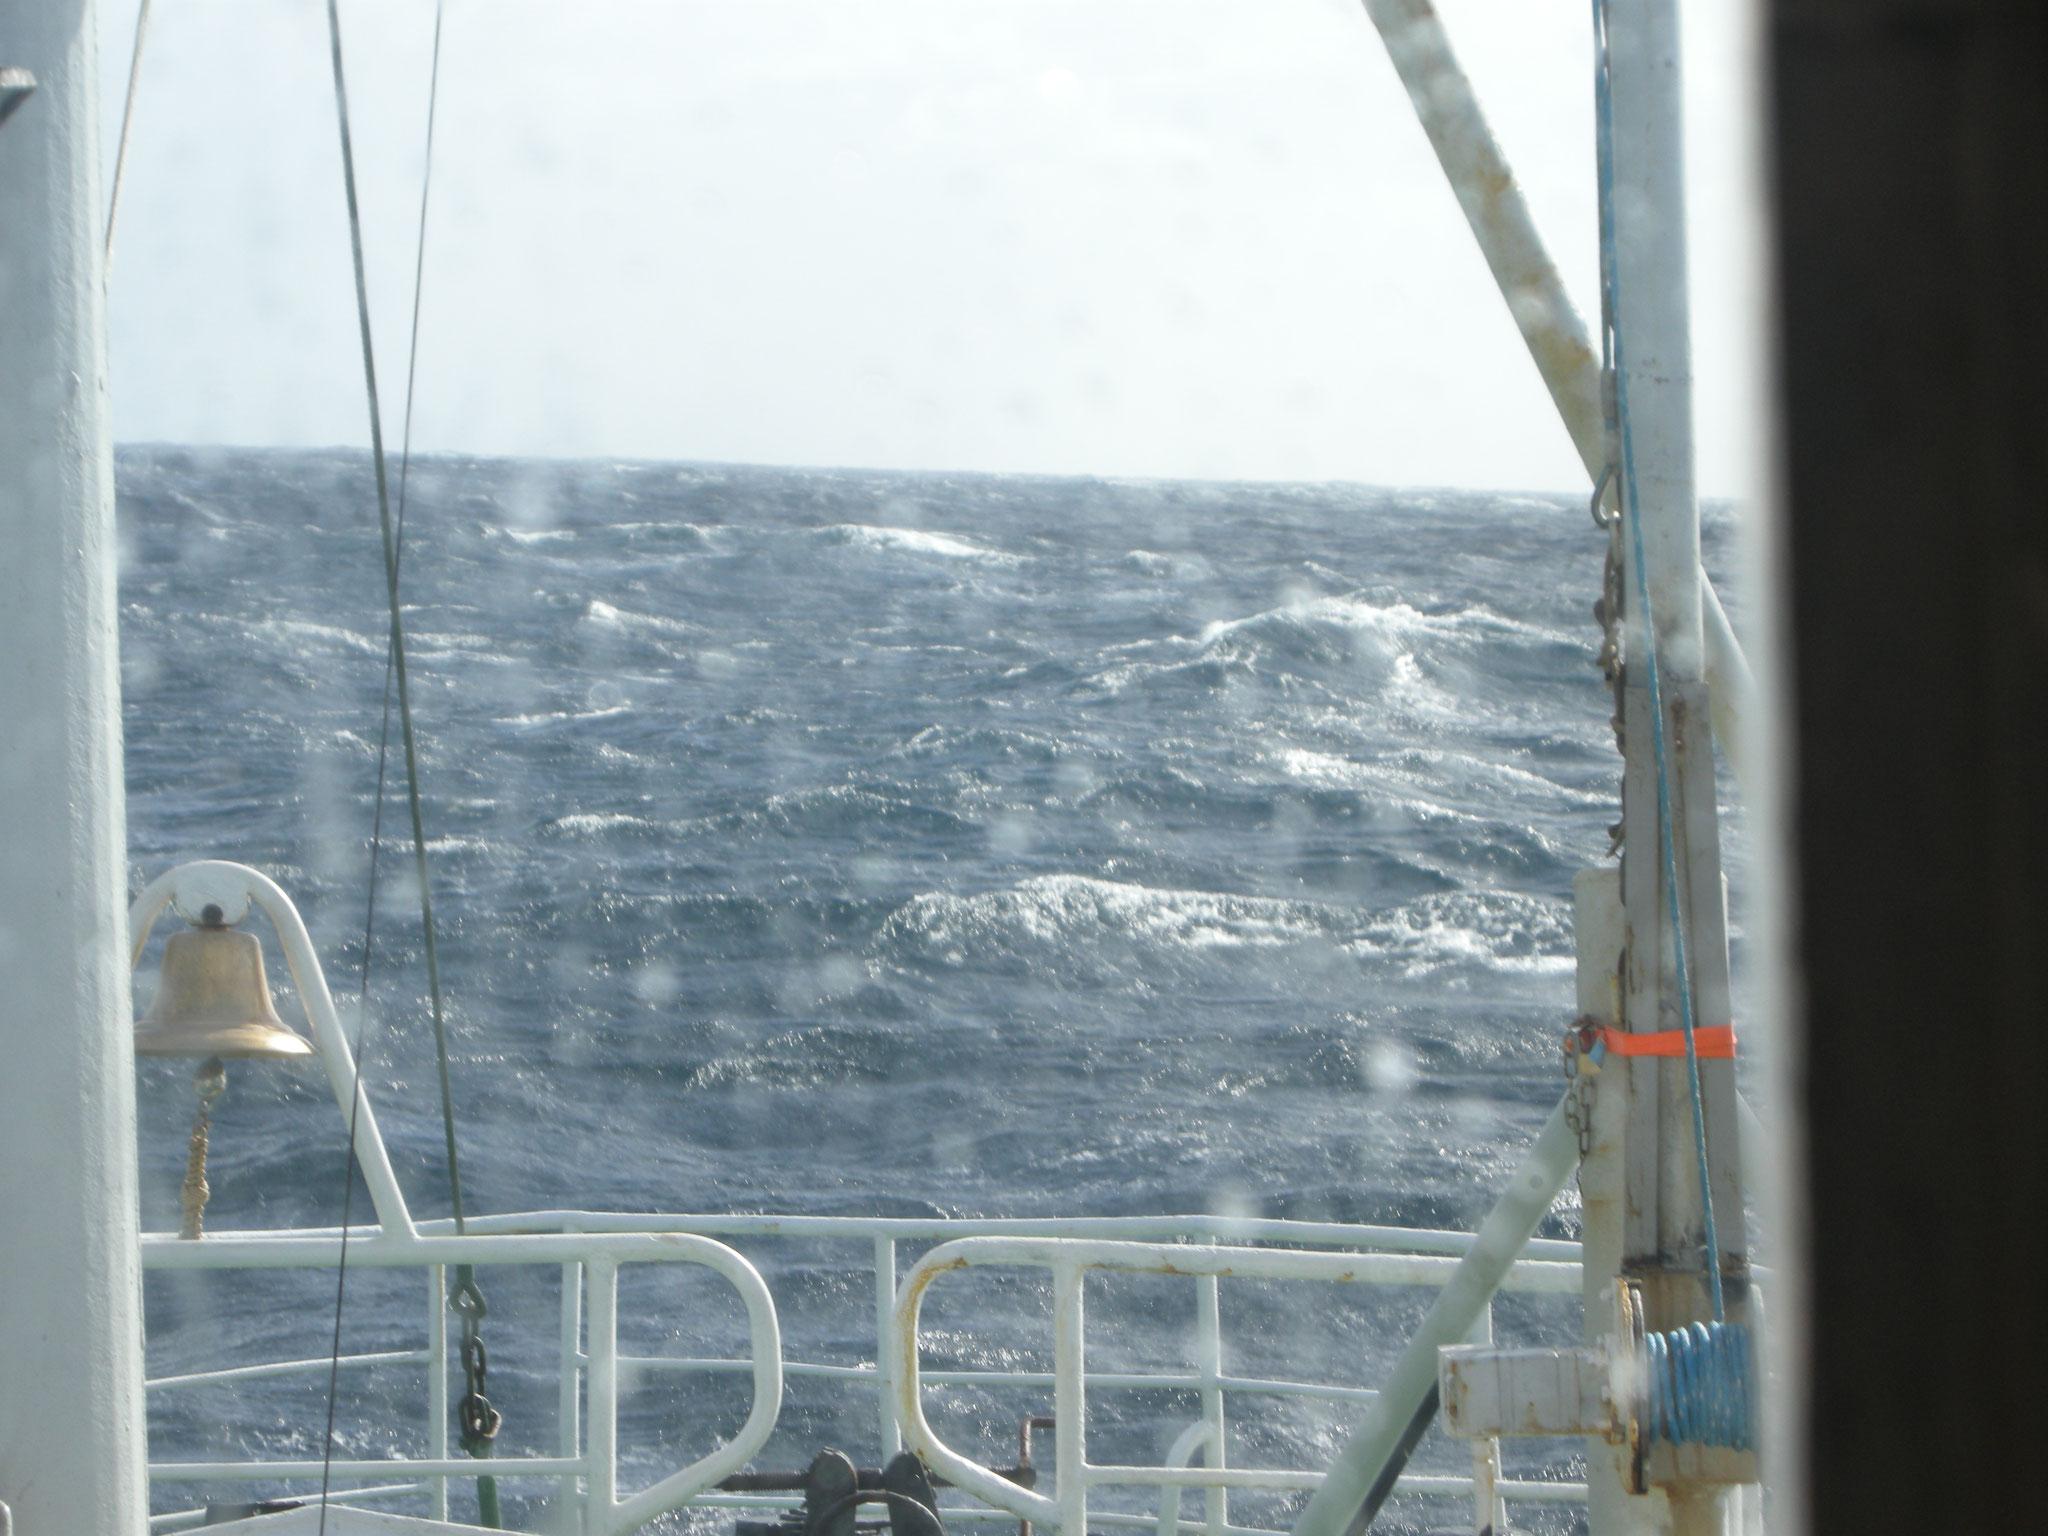 Sturm Windstärke 10 in der Biskaya